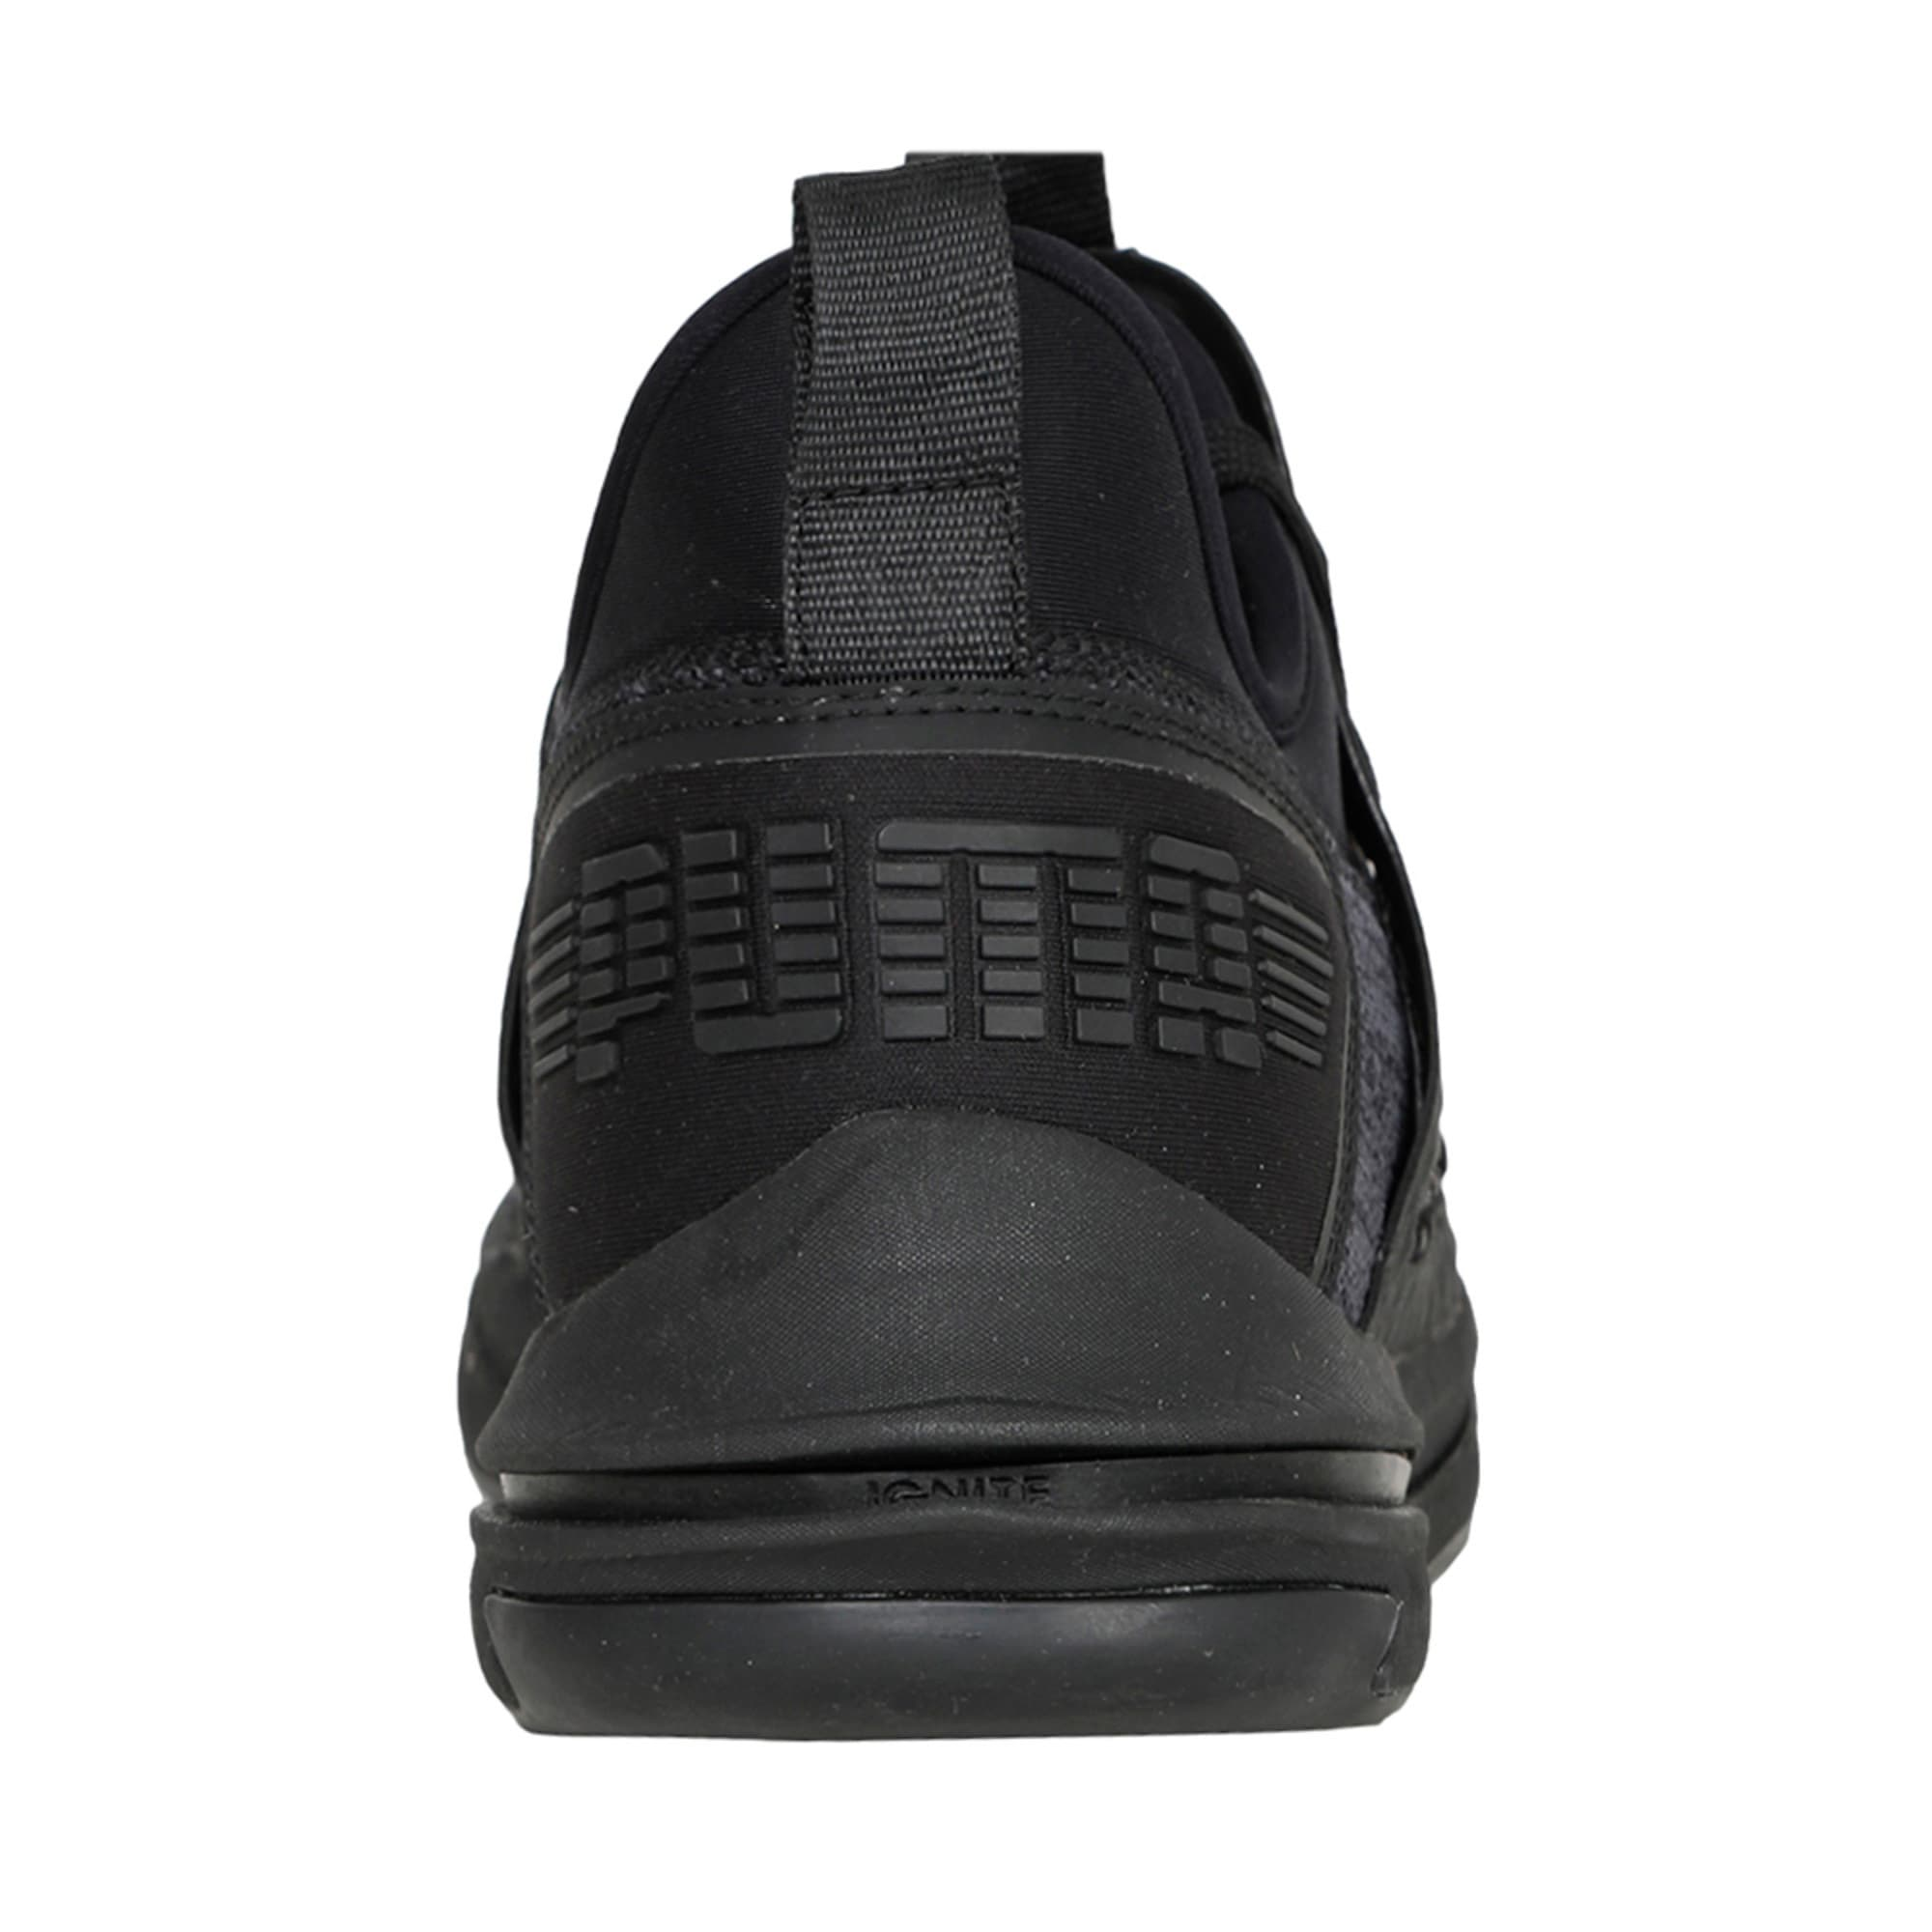 Thumbnail 4 of IGNITE Limitless SR NETFIT Men's Trainer Shoes, Puma Black, medium-IND